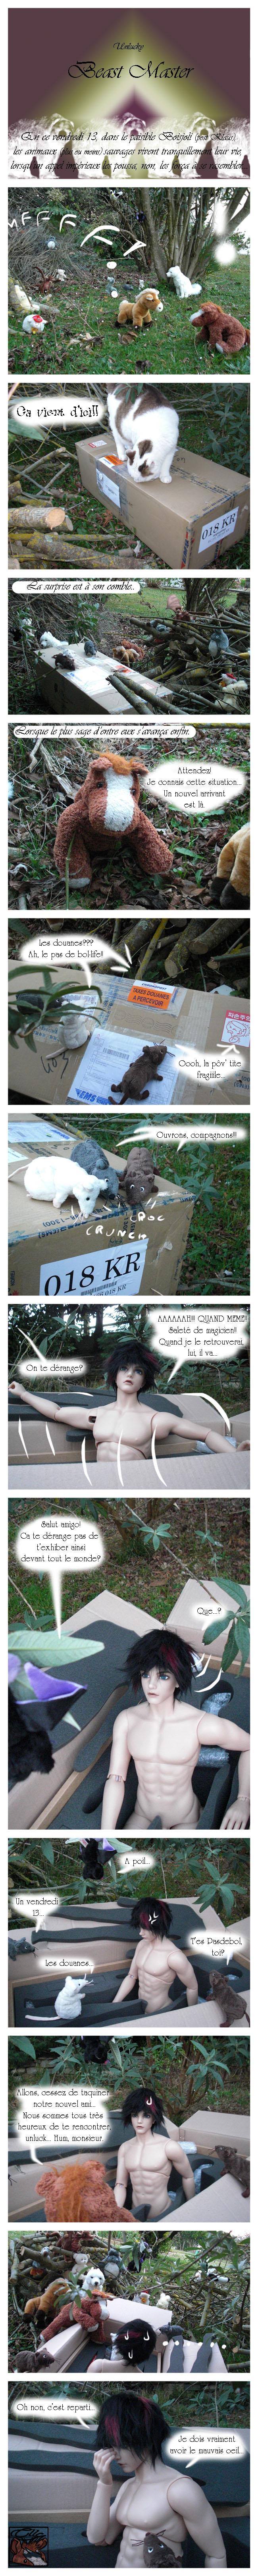 [Heika's 2] A la prochaine ! p.69 Unlucky_Beast_Master_1_by_Monsieur_Cheval